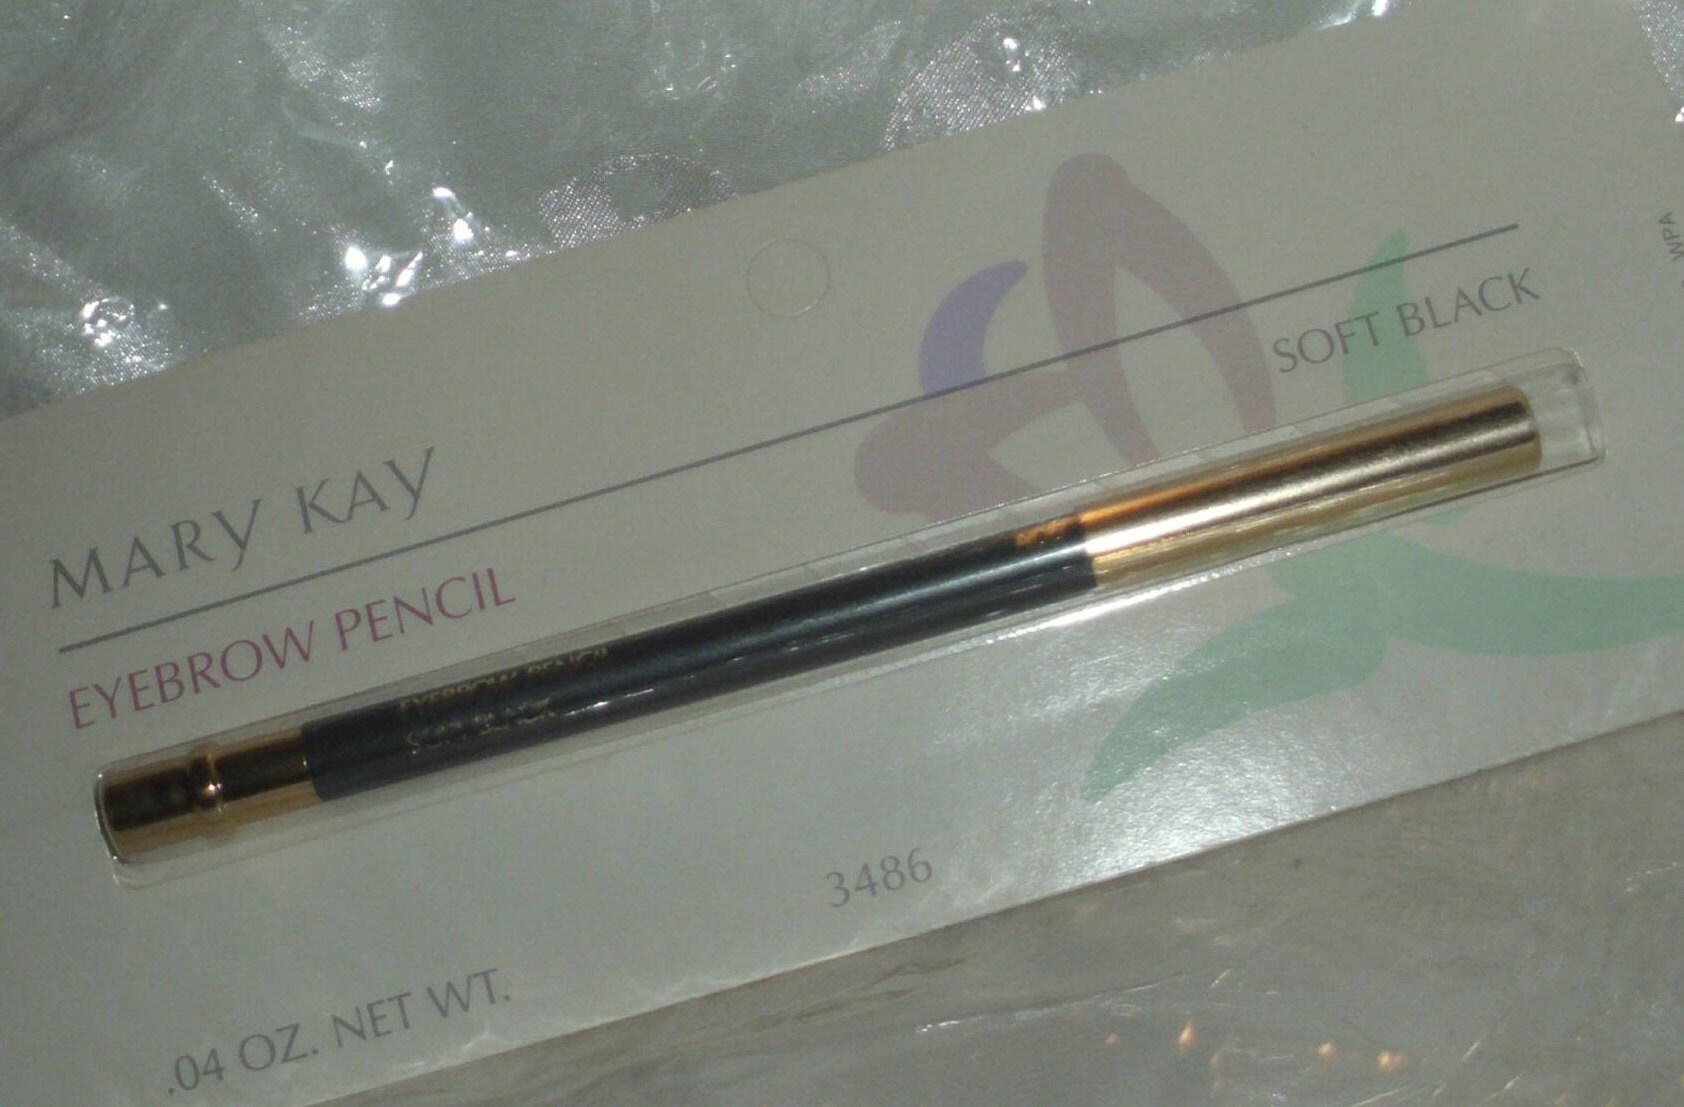 Mary Kay Soft Black Eyebrow Wood Pencil Eye Brow Full Size Etsy